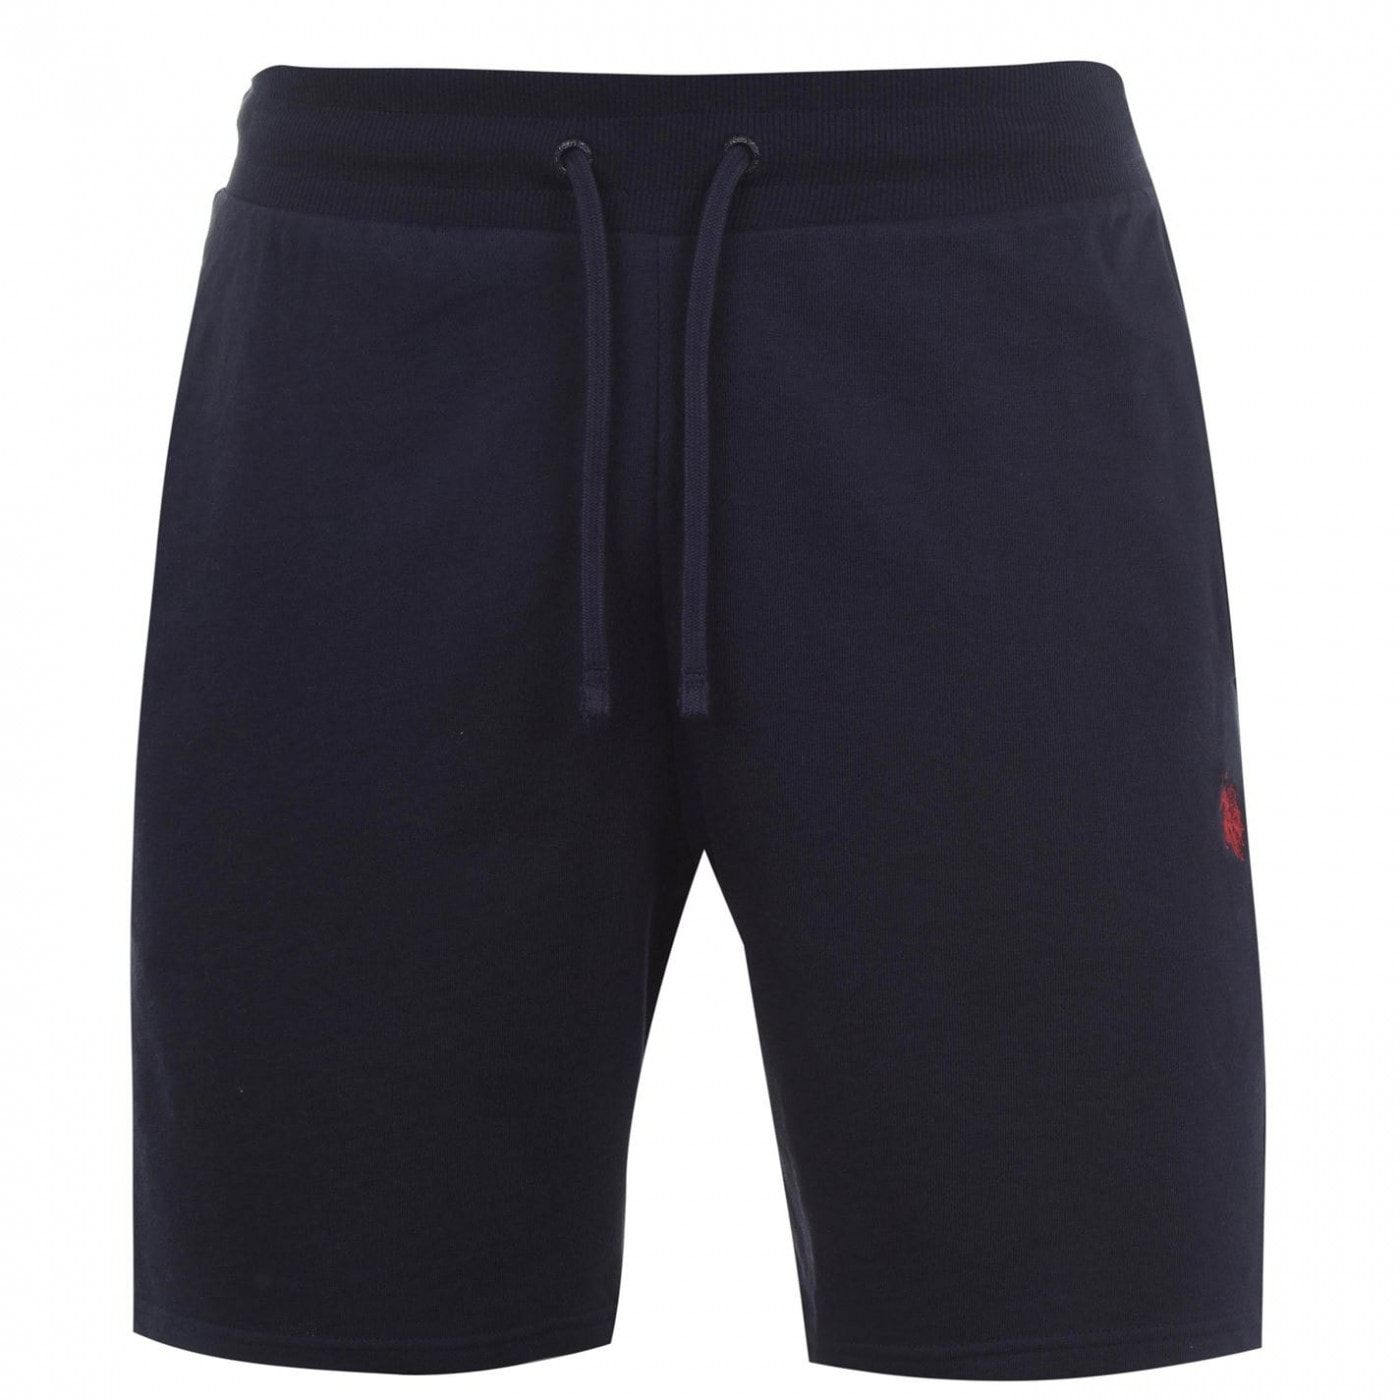 US Polo Assn Core Jersey Shorts